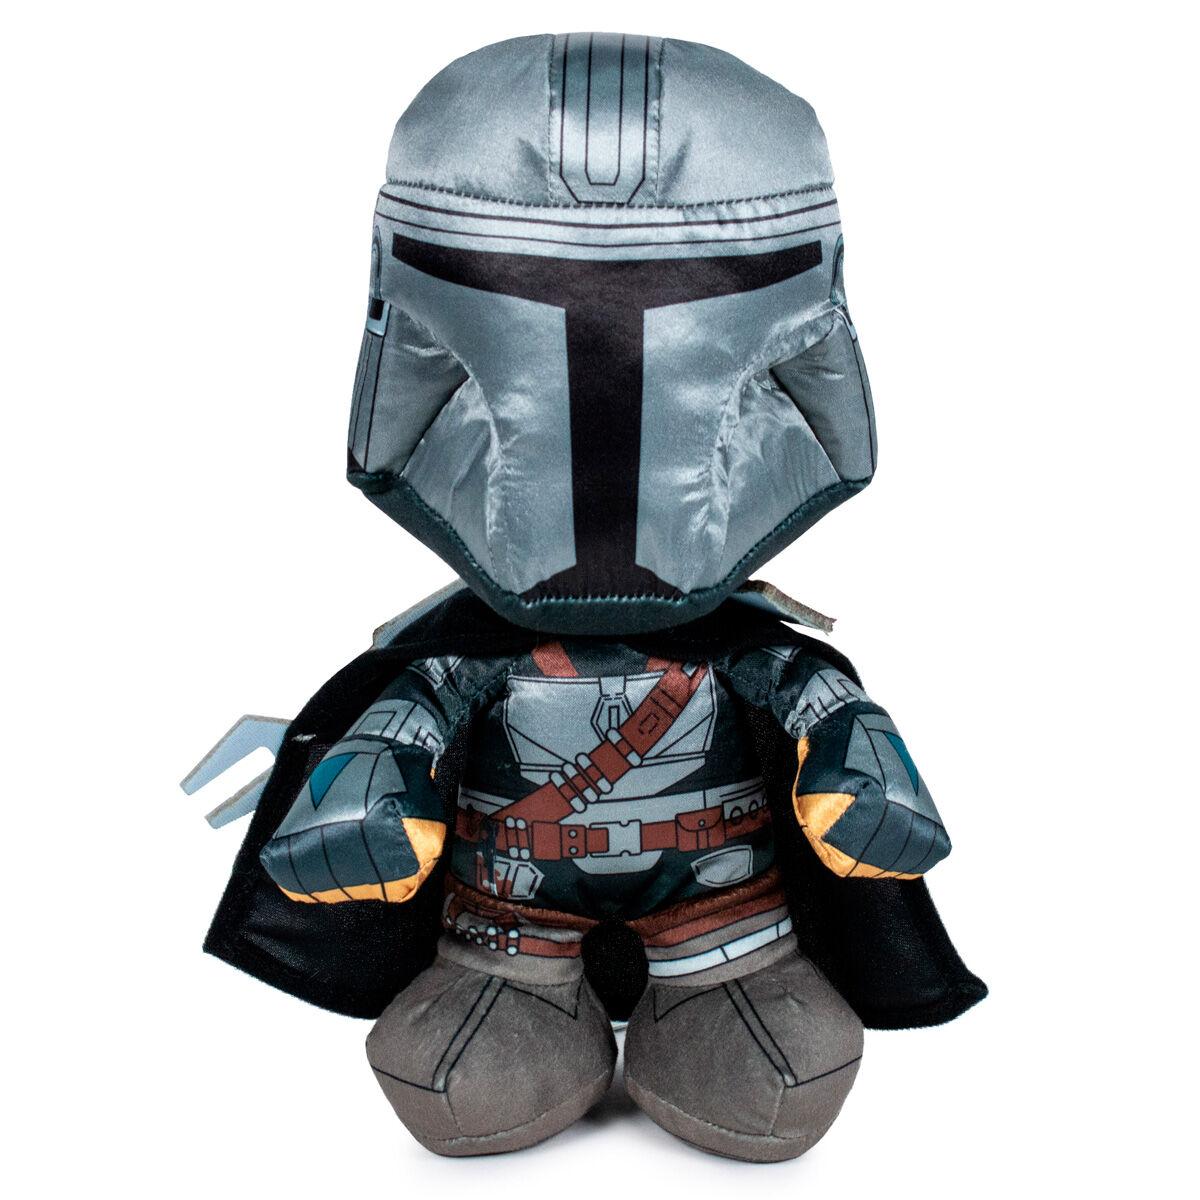 Peluche Warrior Mandalorian Star Wars 25cm 8425611302107